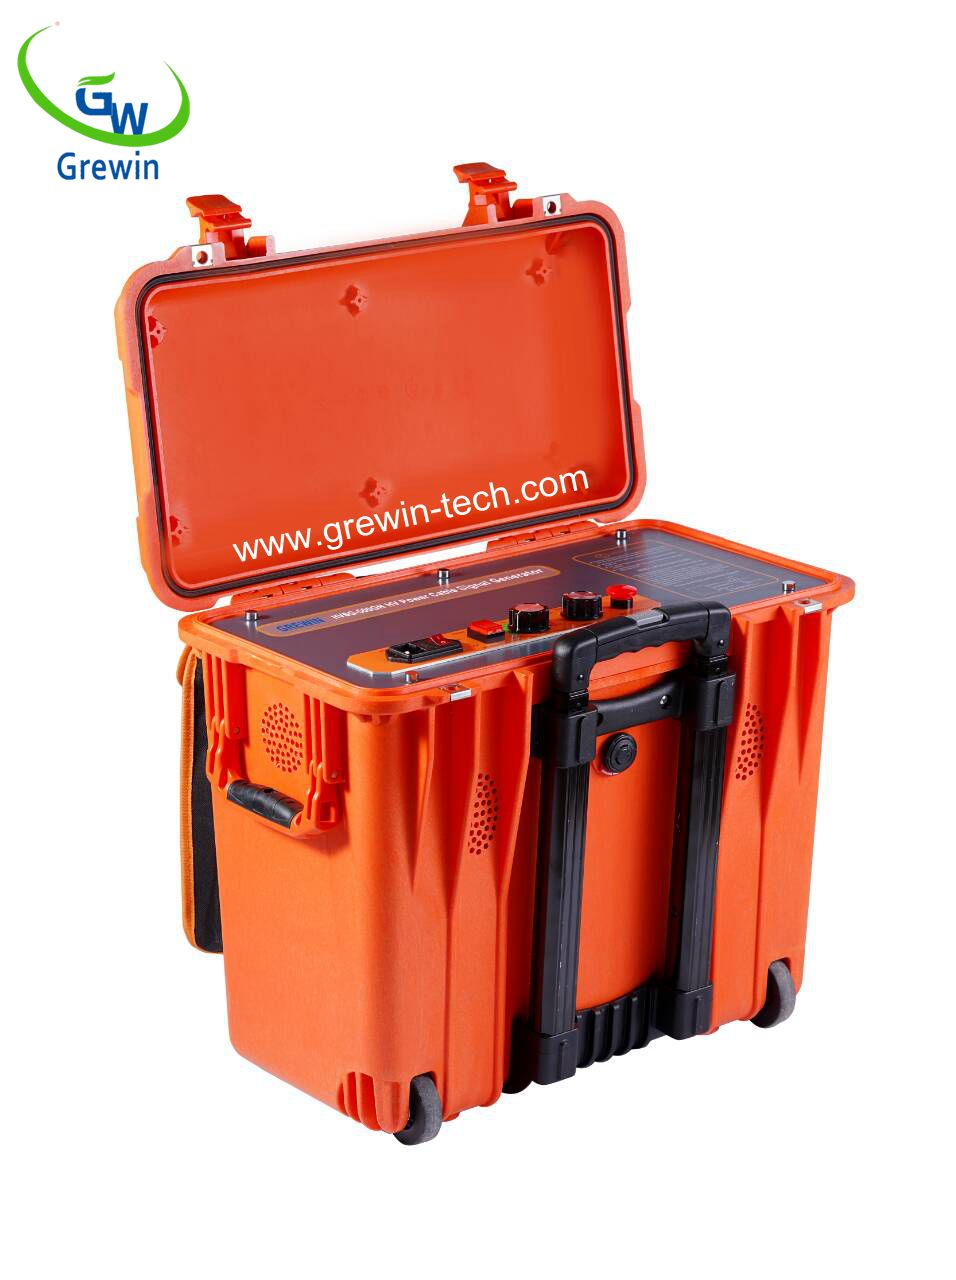 Ac 220V 230 V 50Hz 60Hz 0-32KV 2000J Cable Fault Lokaliseren Geïntegreerde Hoge Spanning Signaal Generator